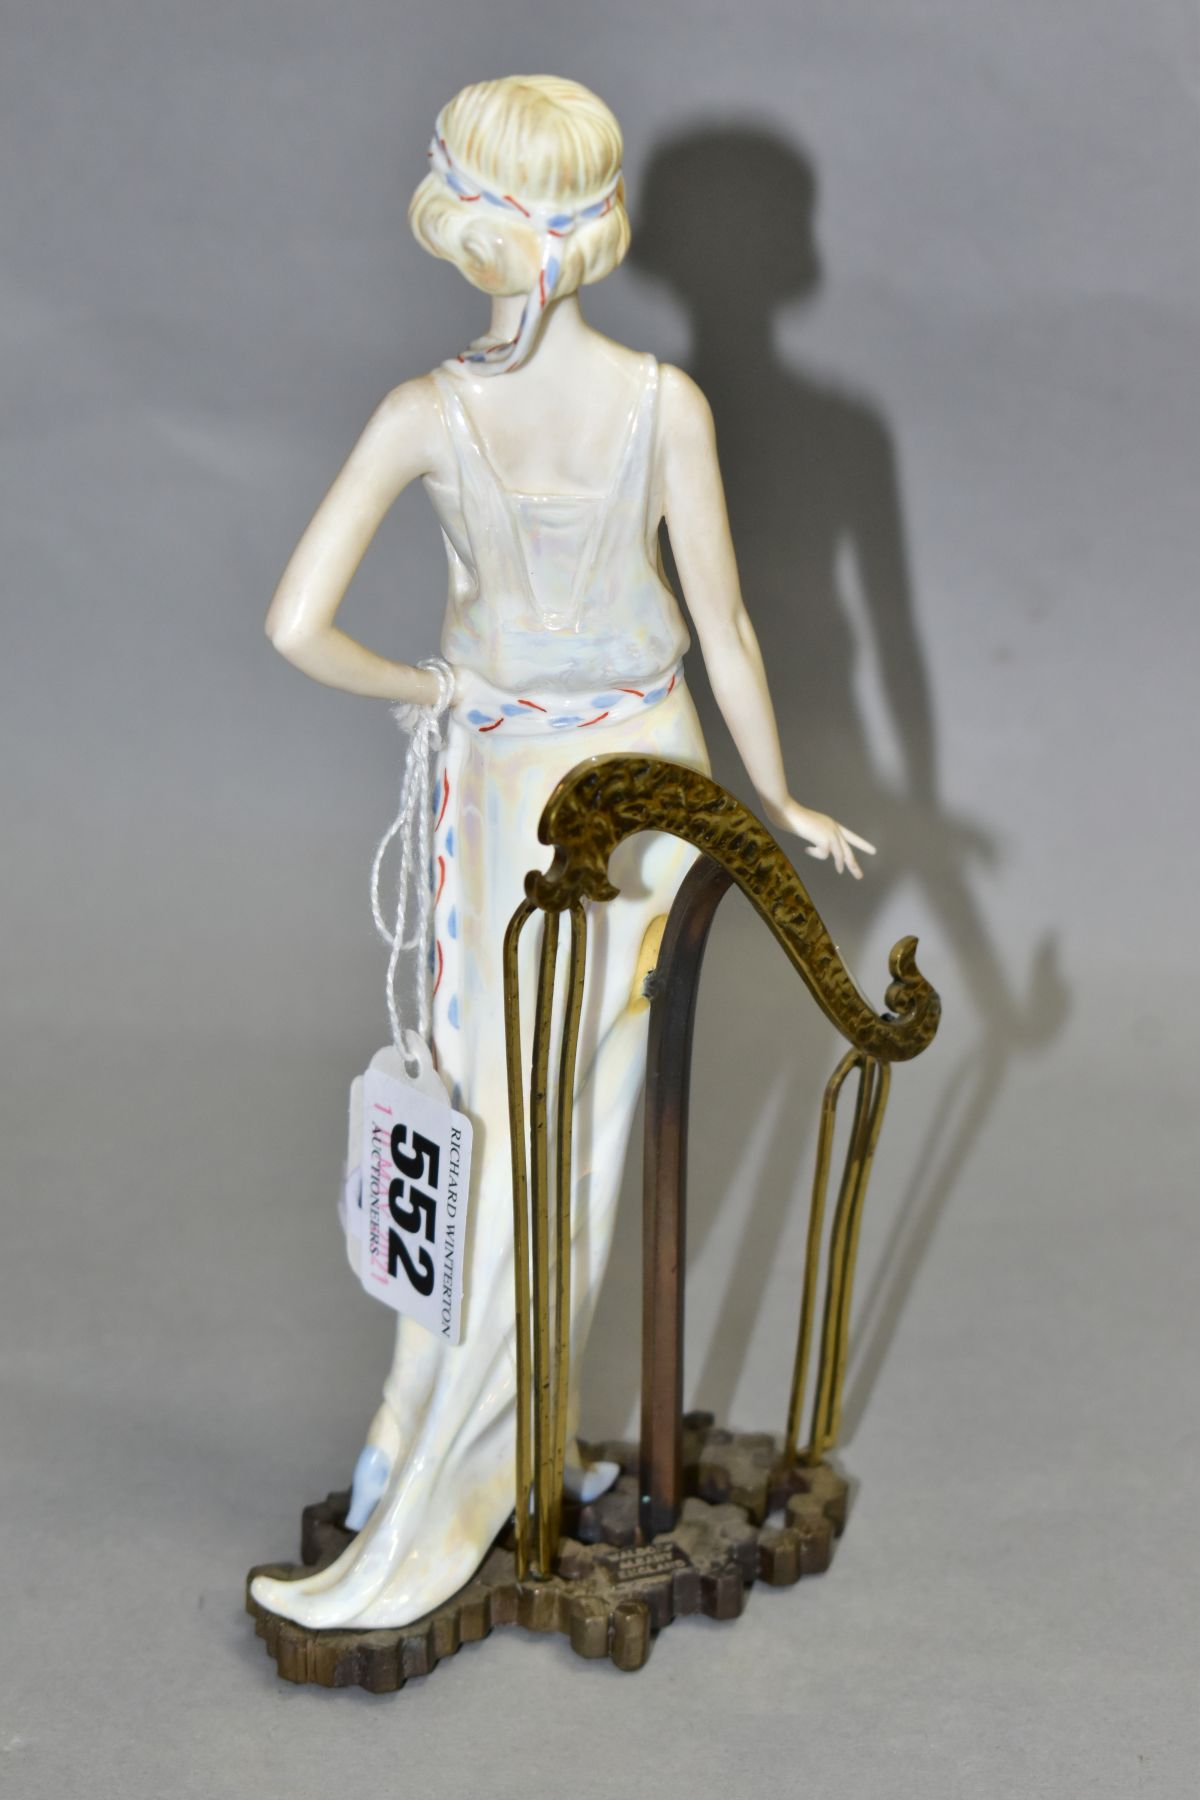 AN ALBANY BONE CHINA AND BRONZED 1920's FIGURINE, 'Waldorf', impressed mark to base, height 20cm ( - Image 3 of 6